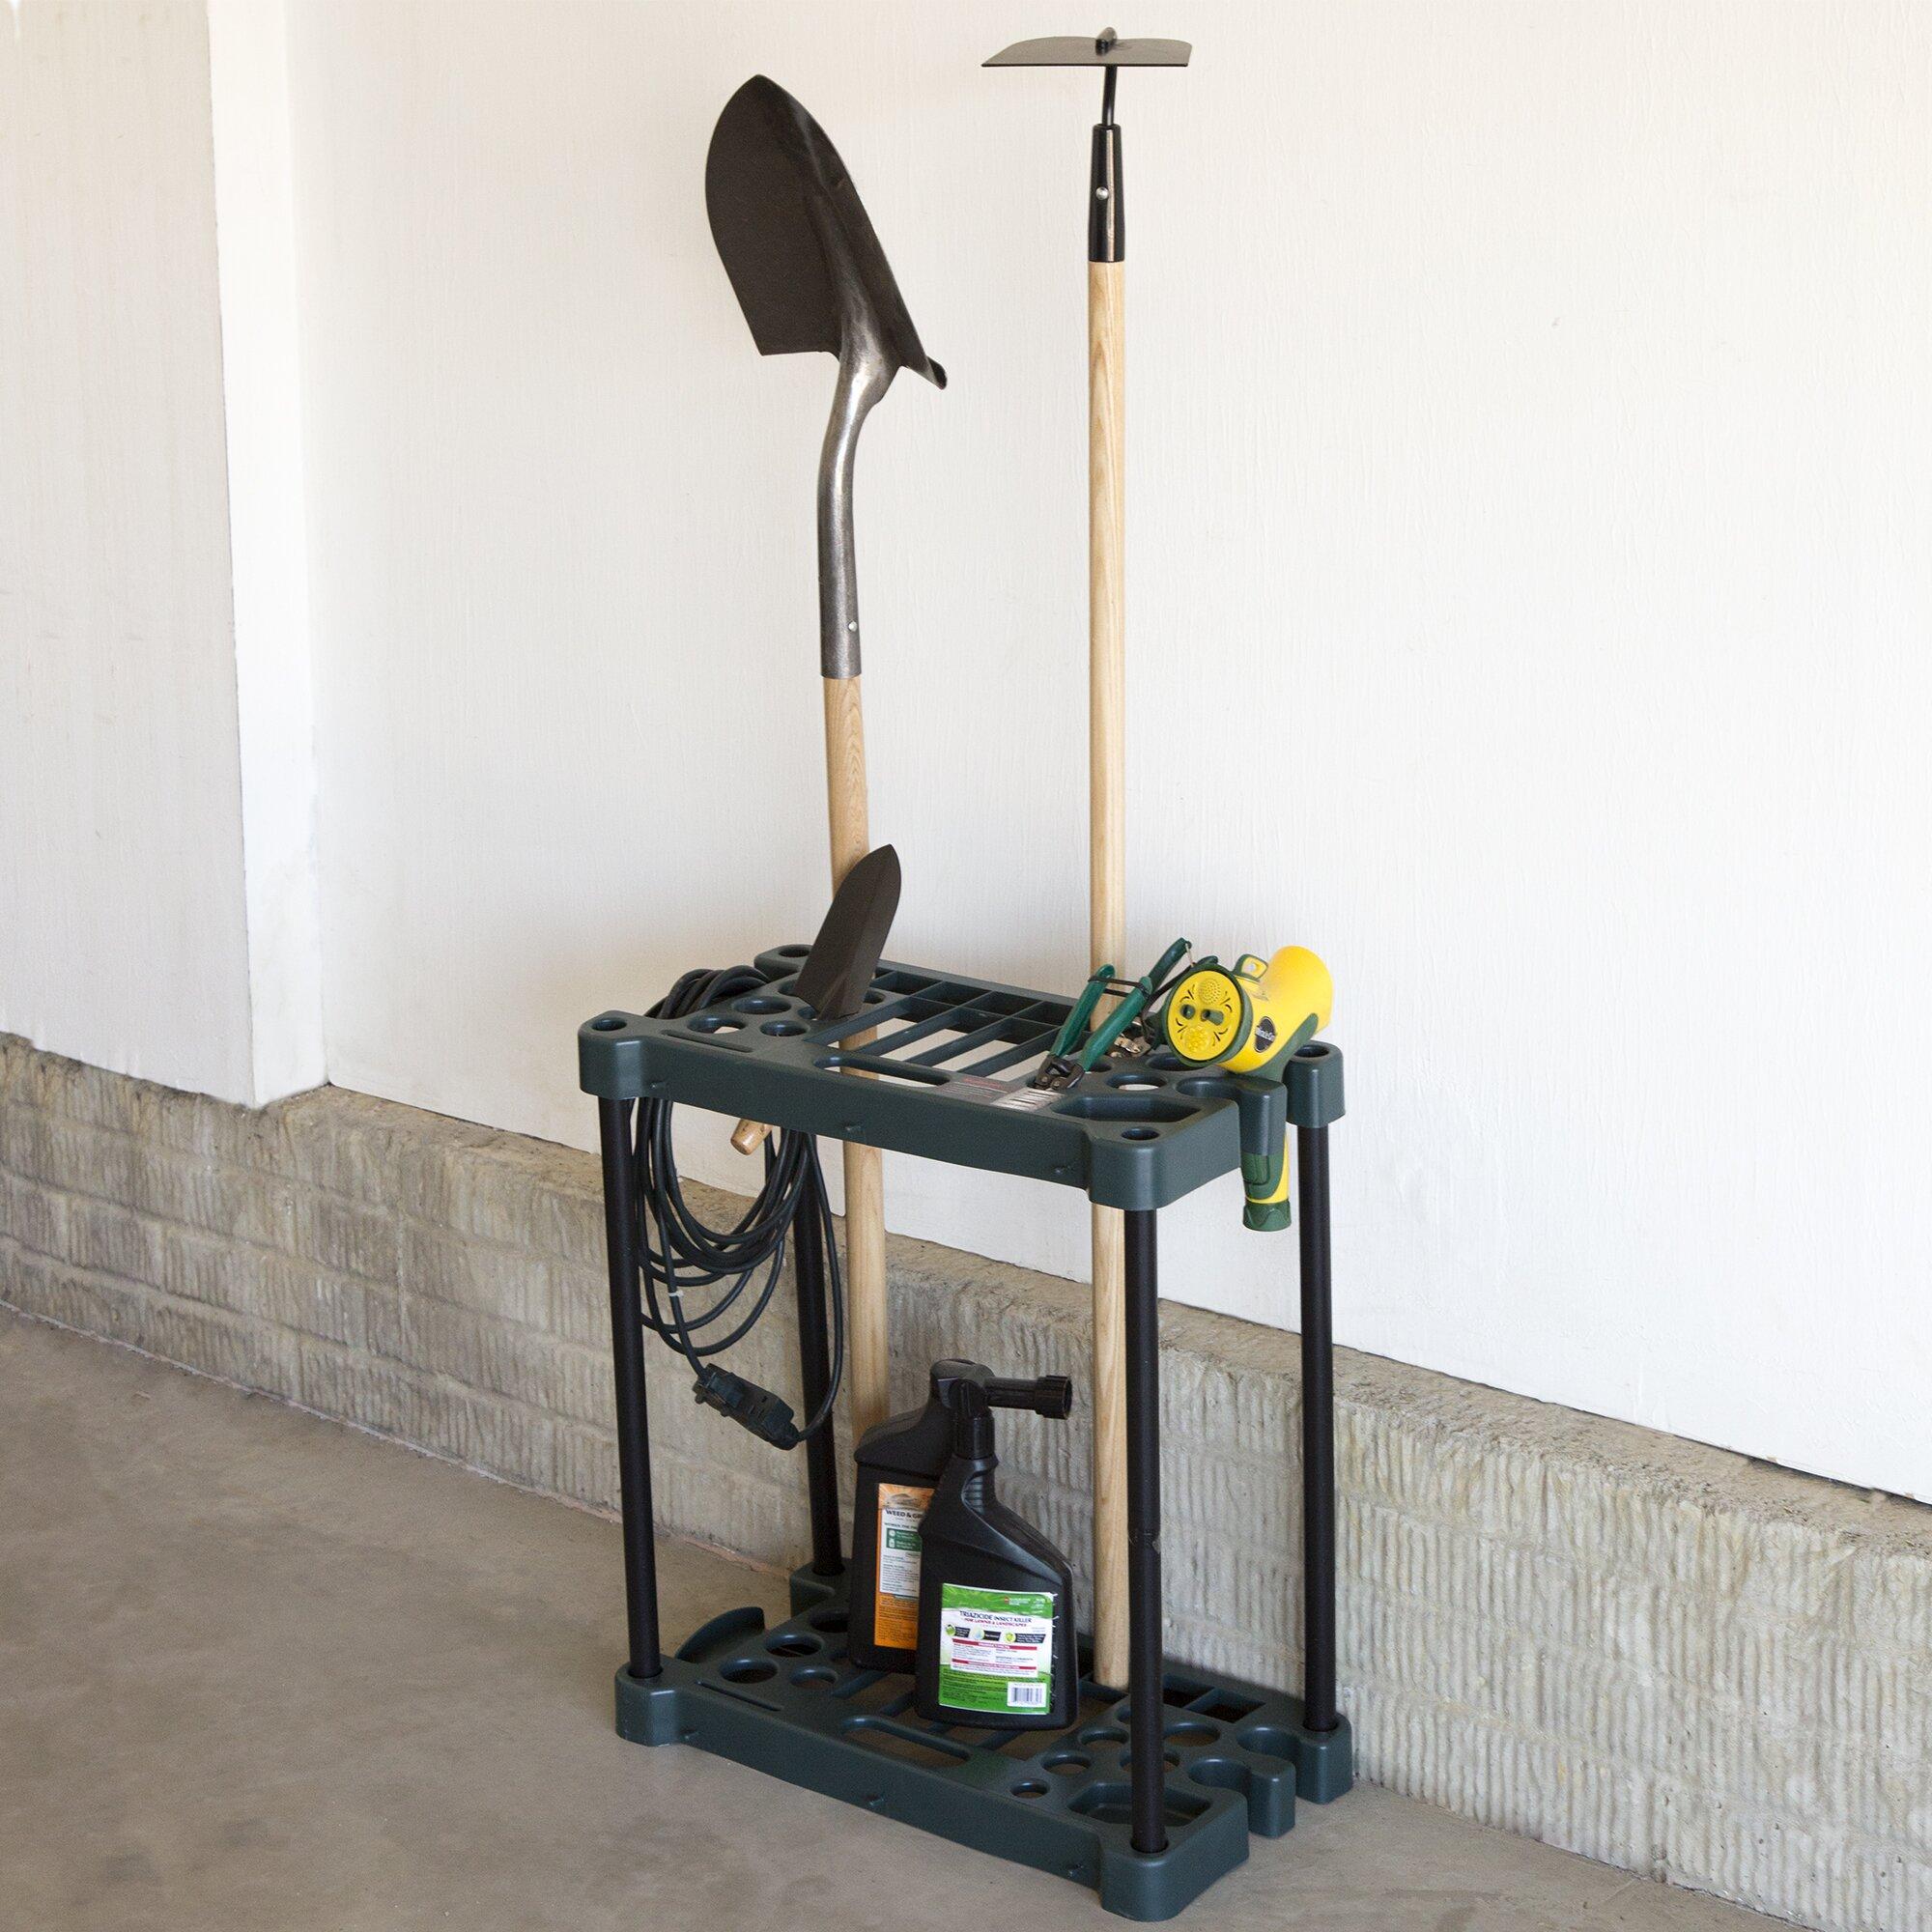 stalwart compact garden tool rack reviews. Black Bedroom Furniture Sets. Home Design Ideas